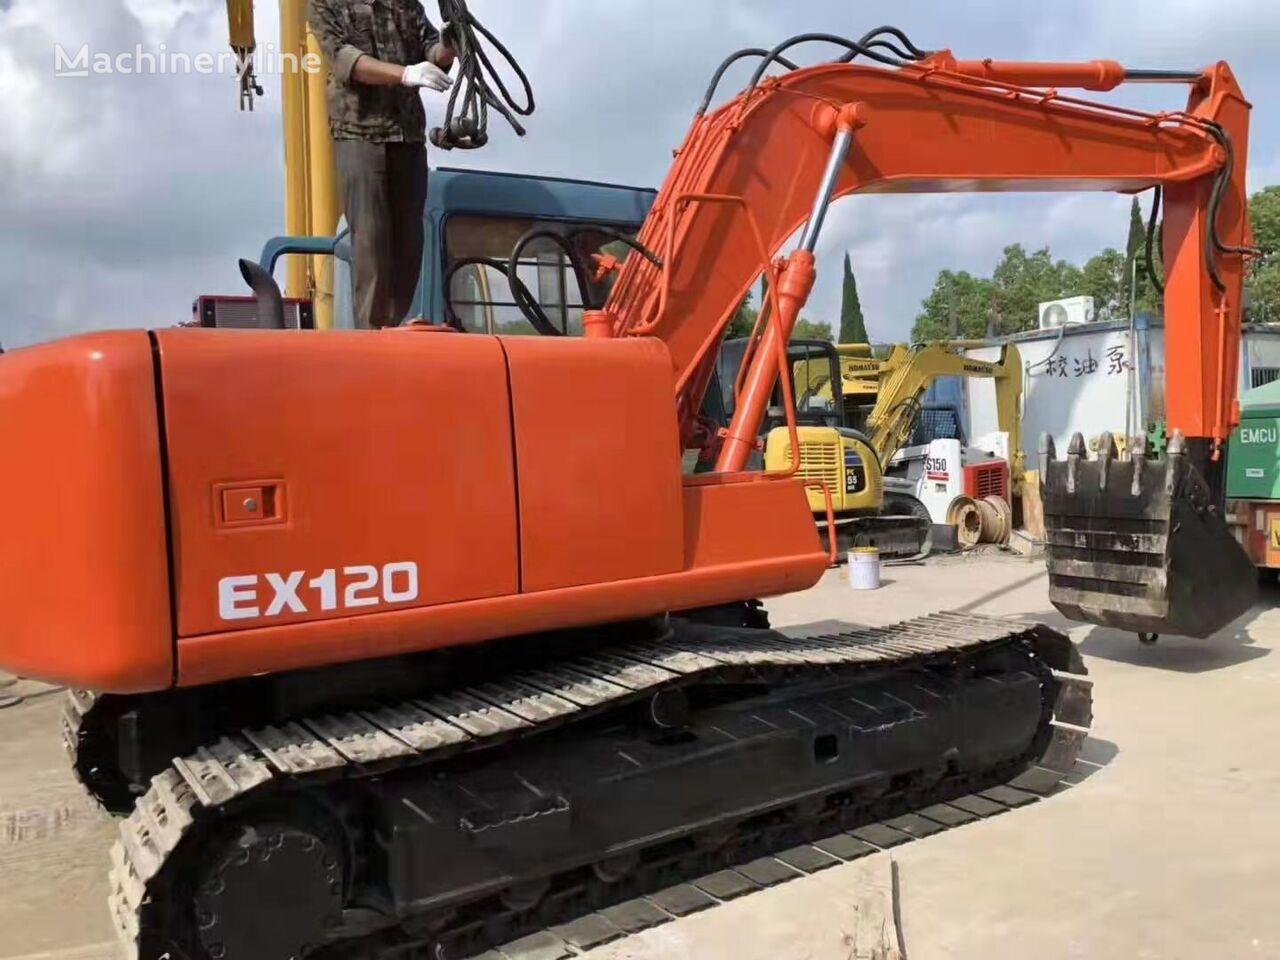 HITACHI EX120  tracked excavator